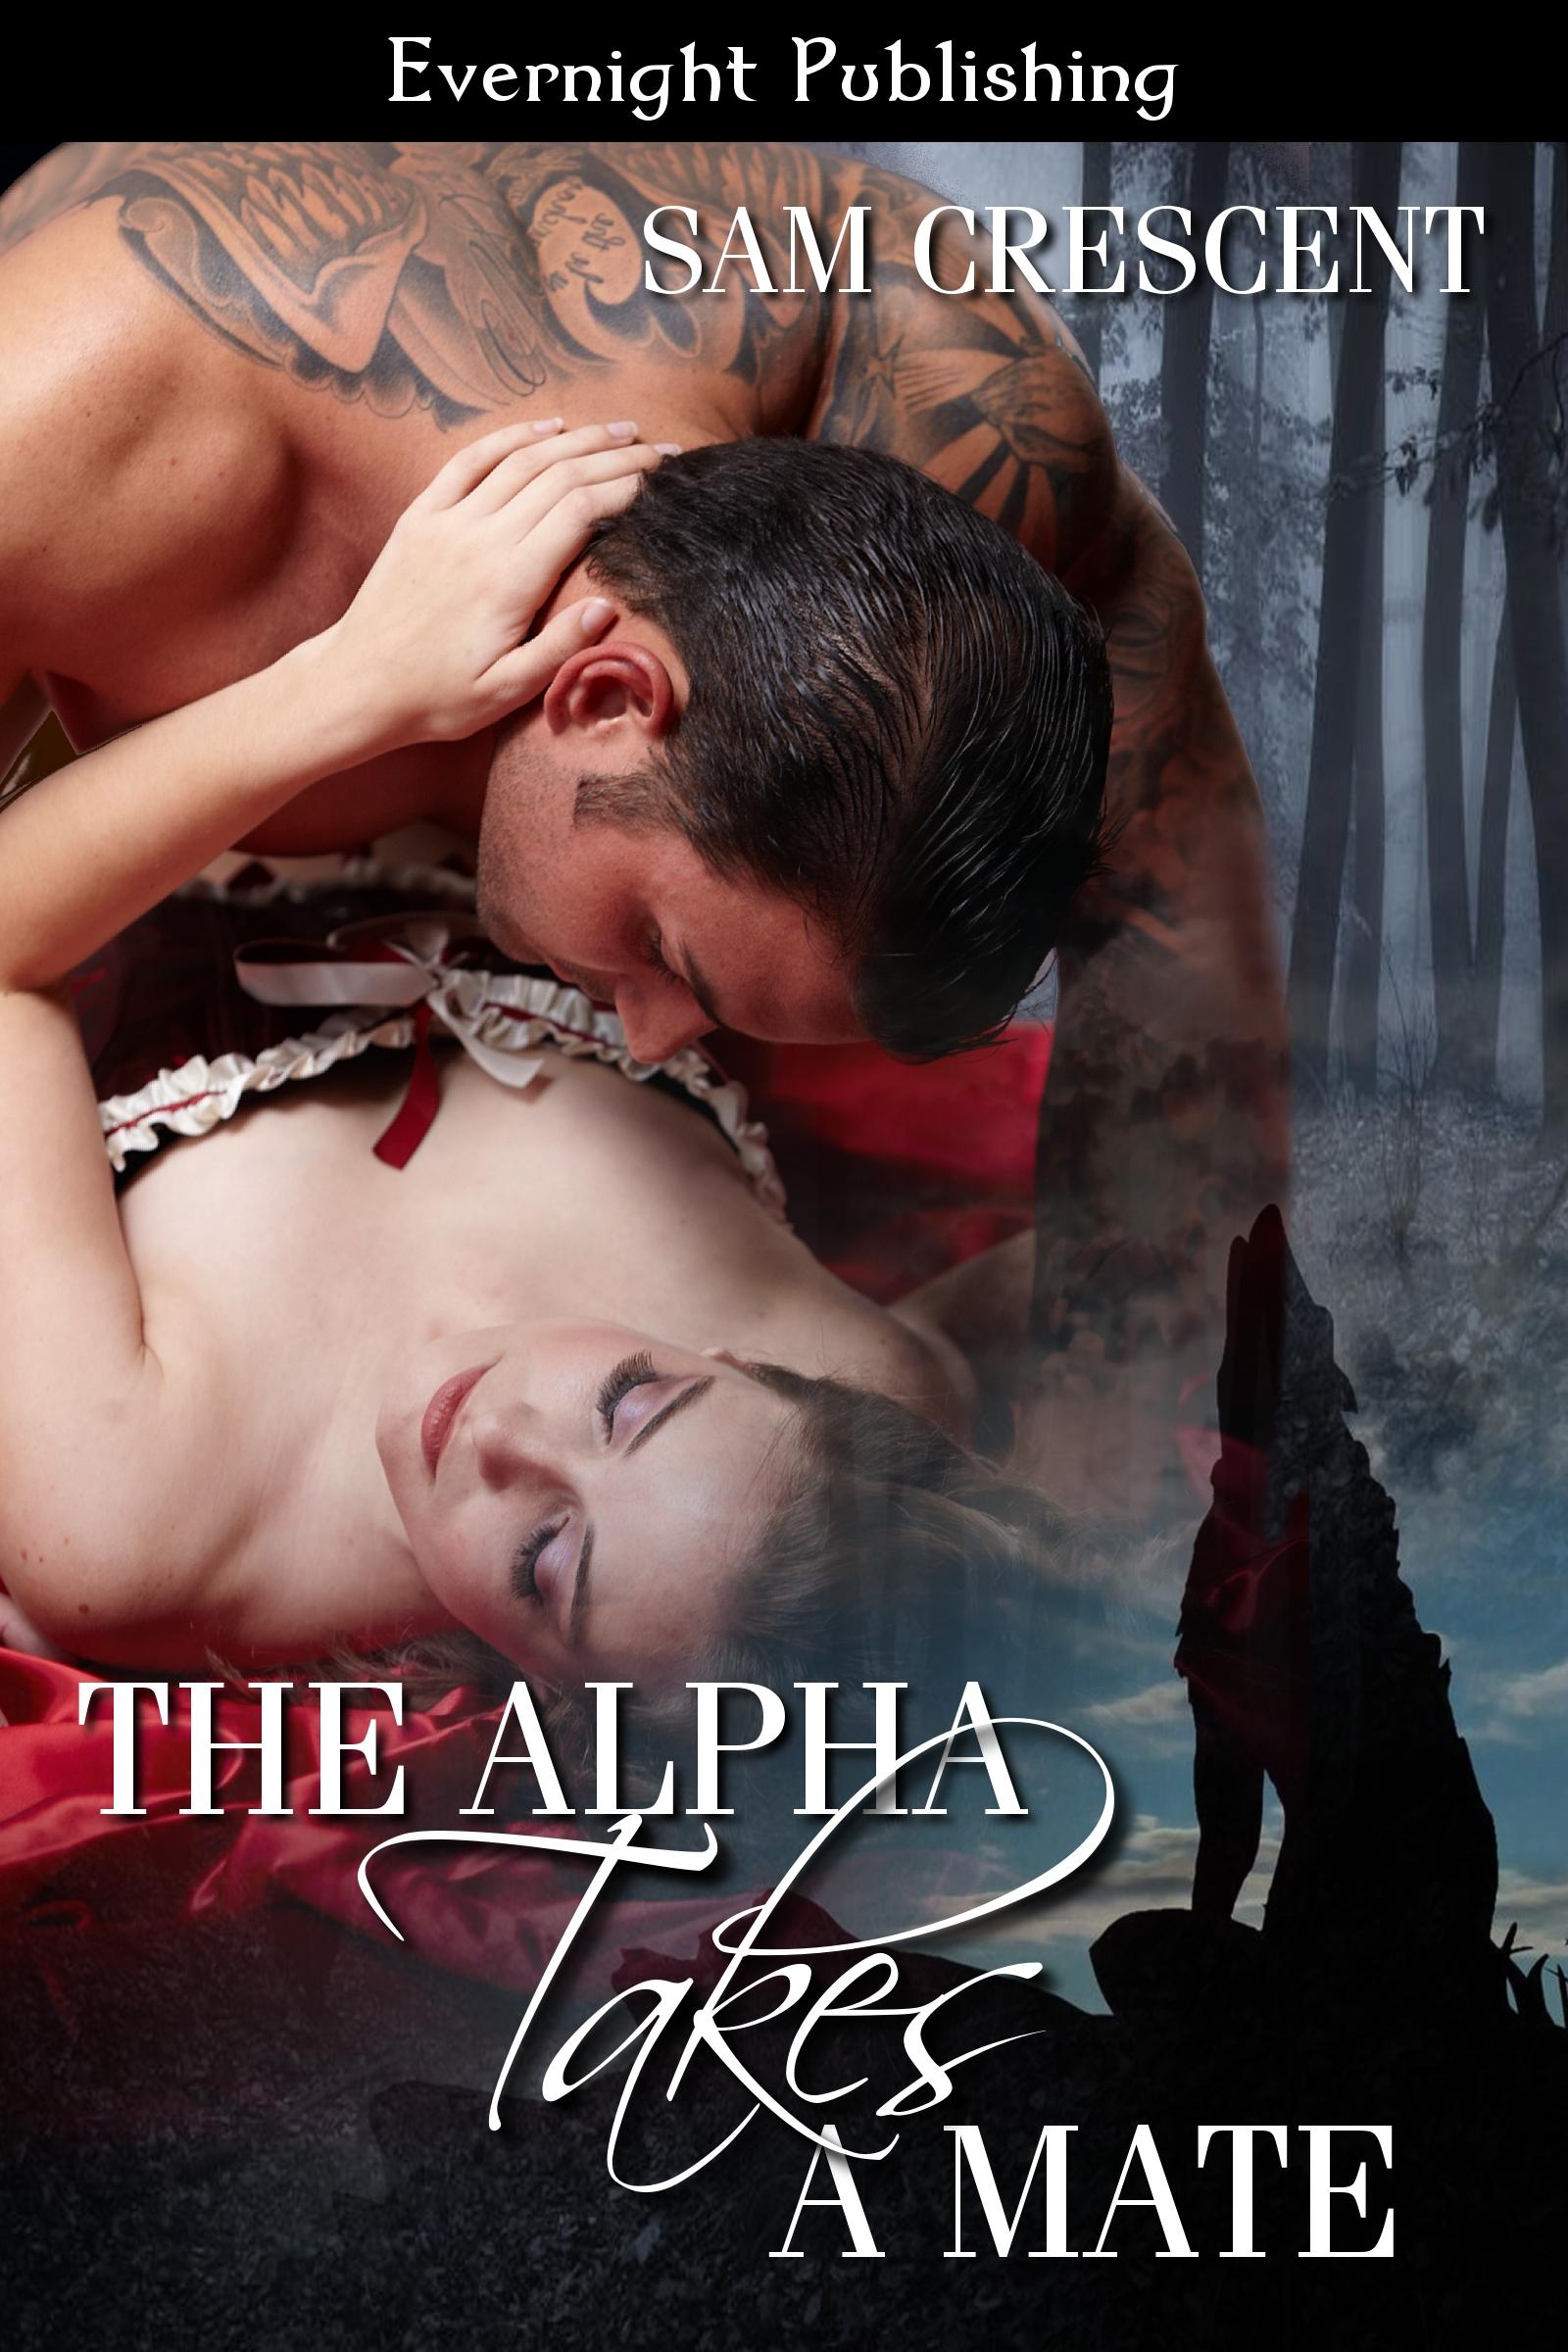 Sam Crescent - The Alpha Takes a Mate